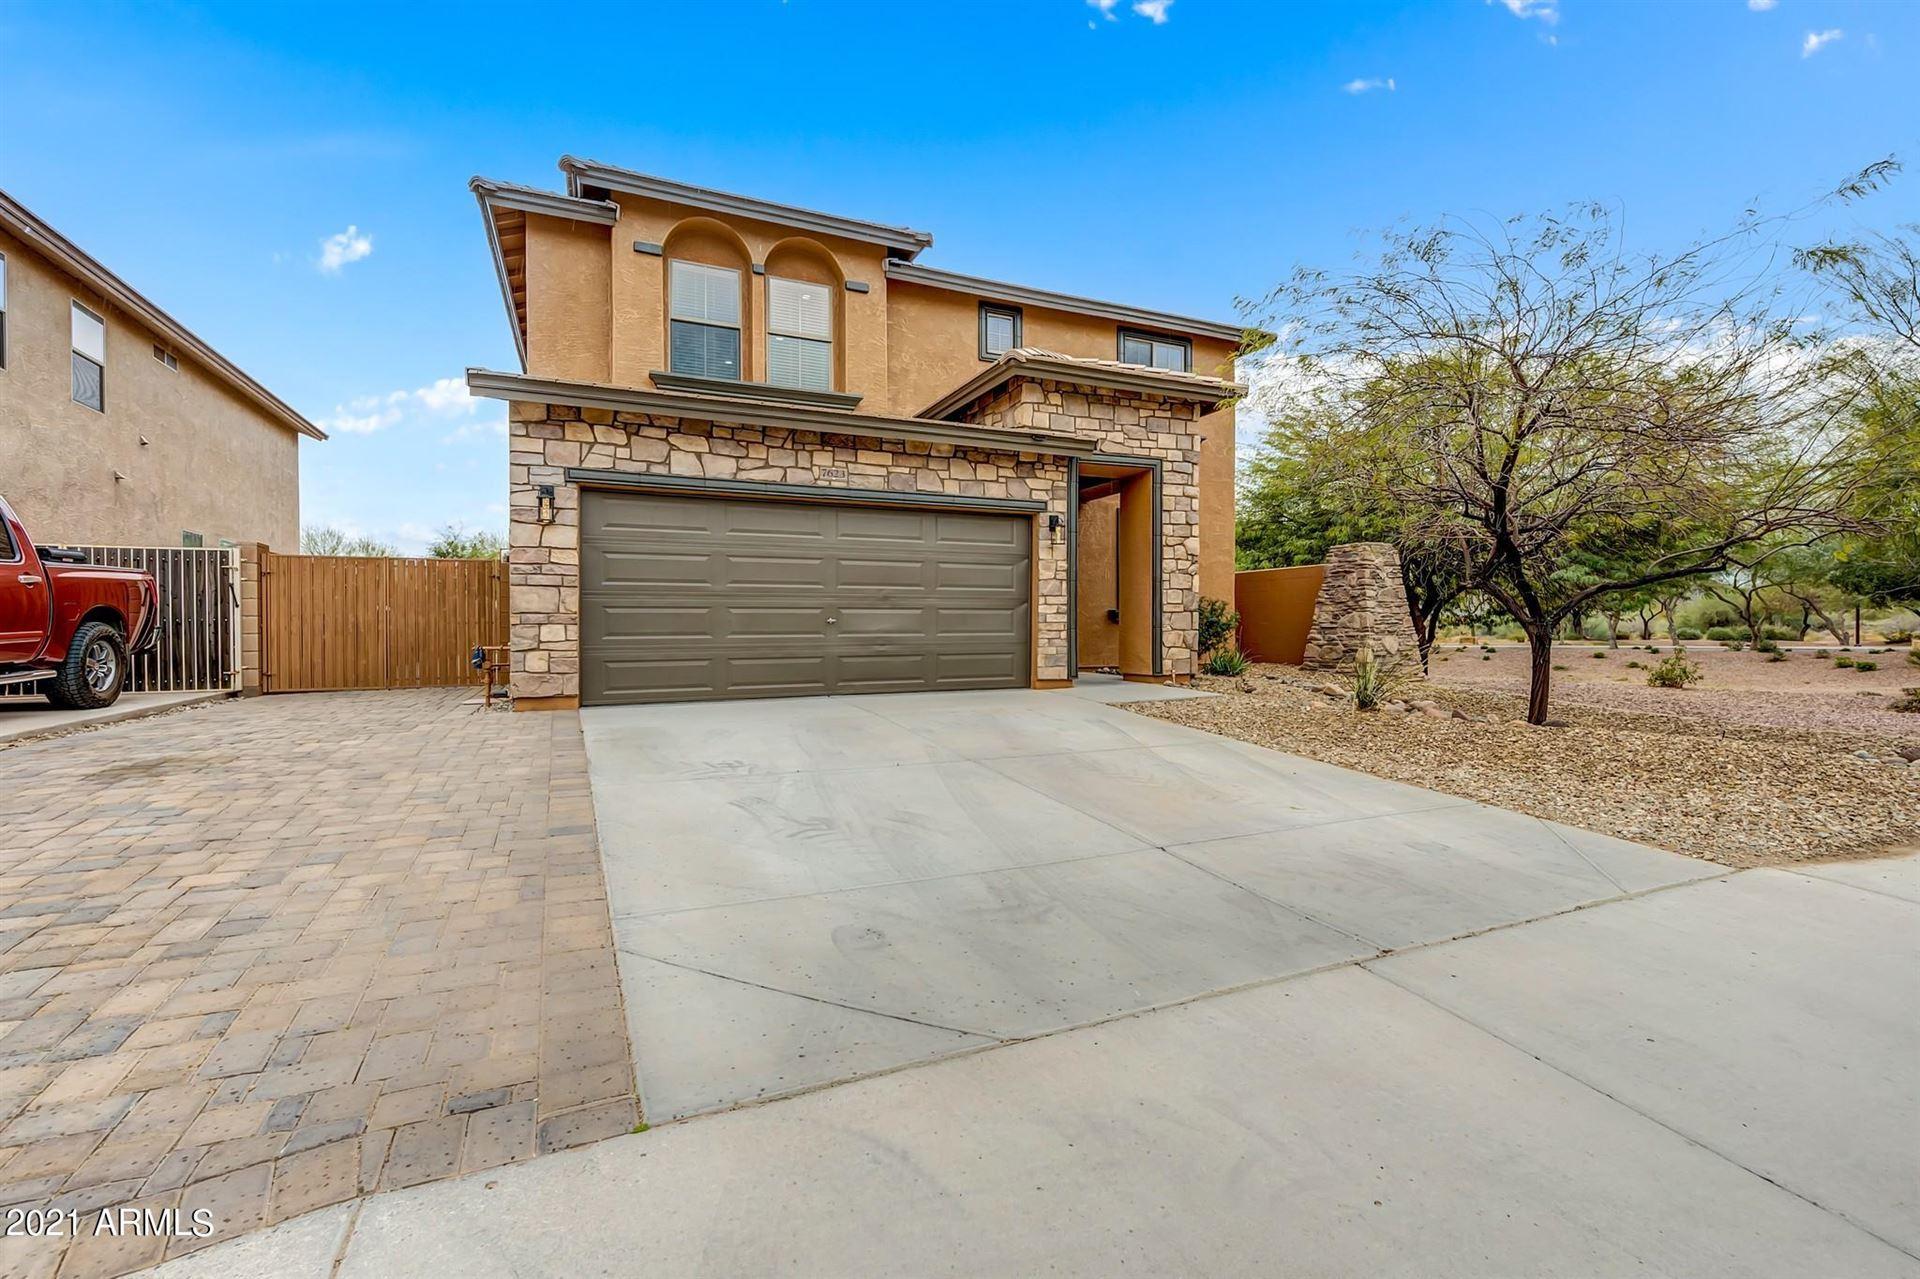 7623 W ANDREA Drive, Peoria, AZ 85383 - #: 6207750